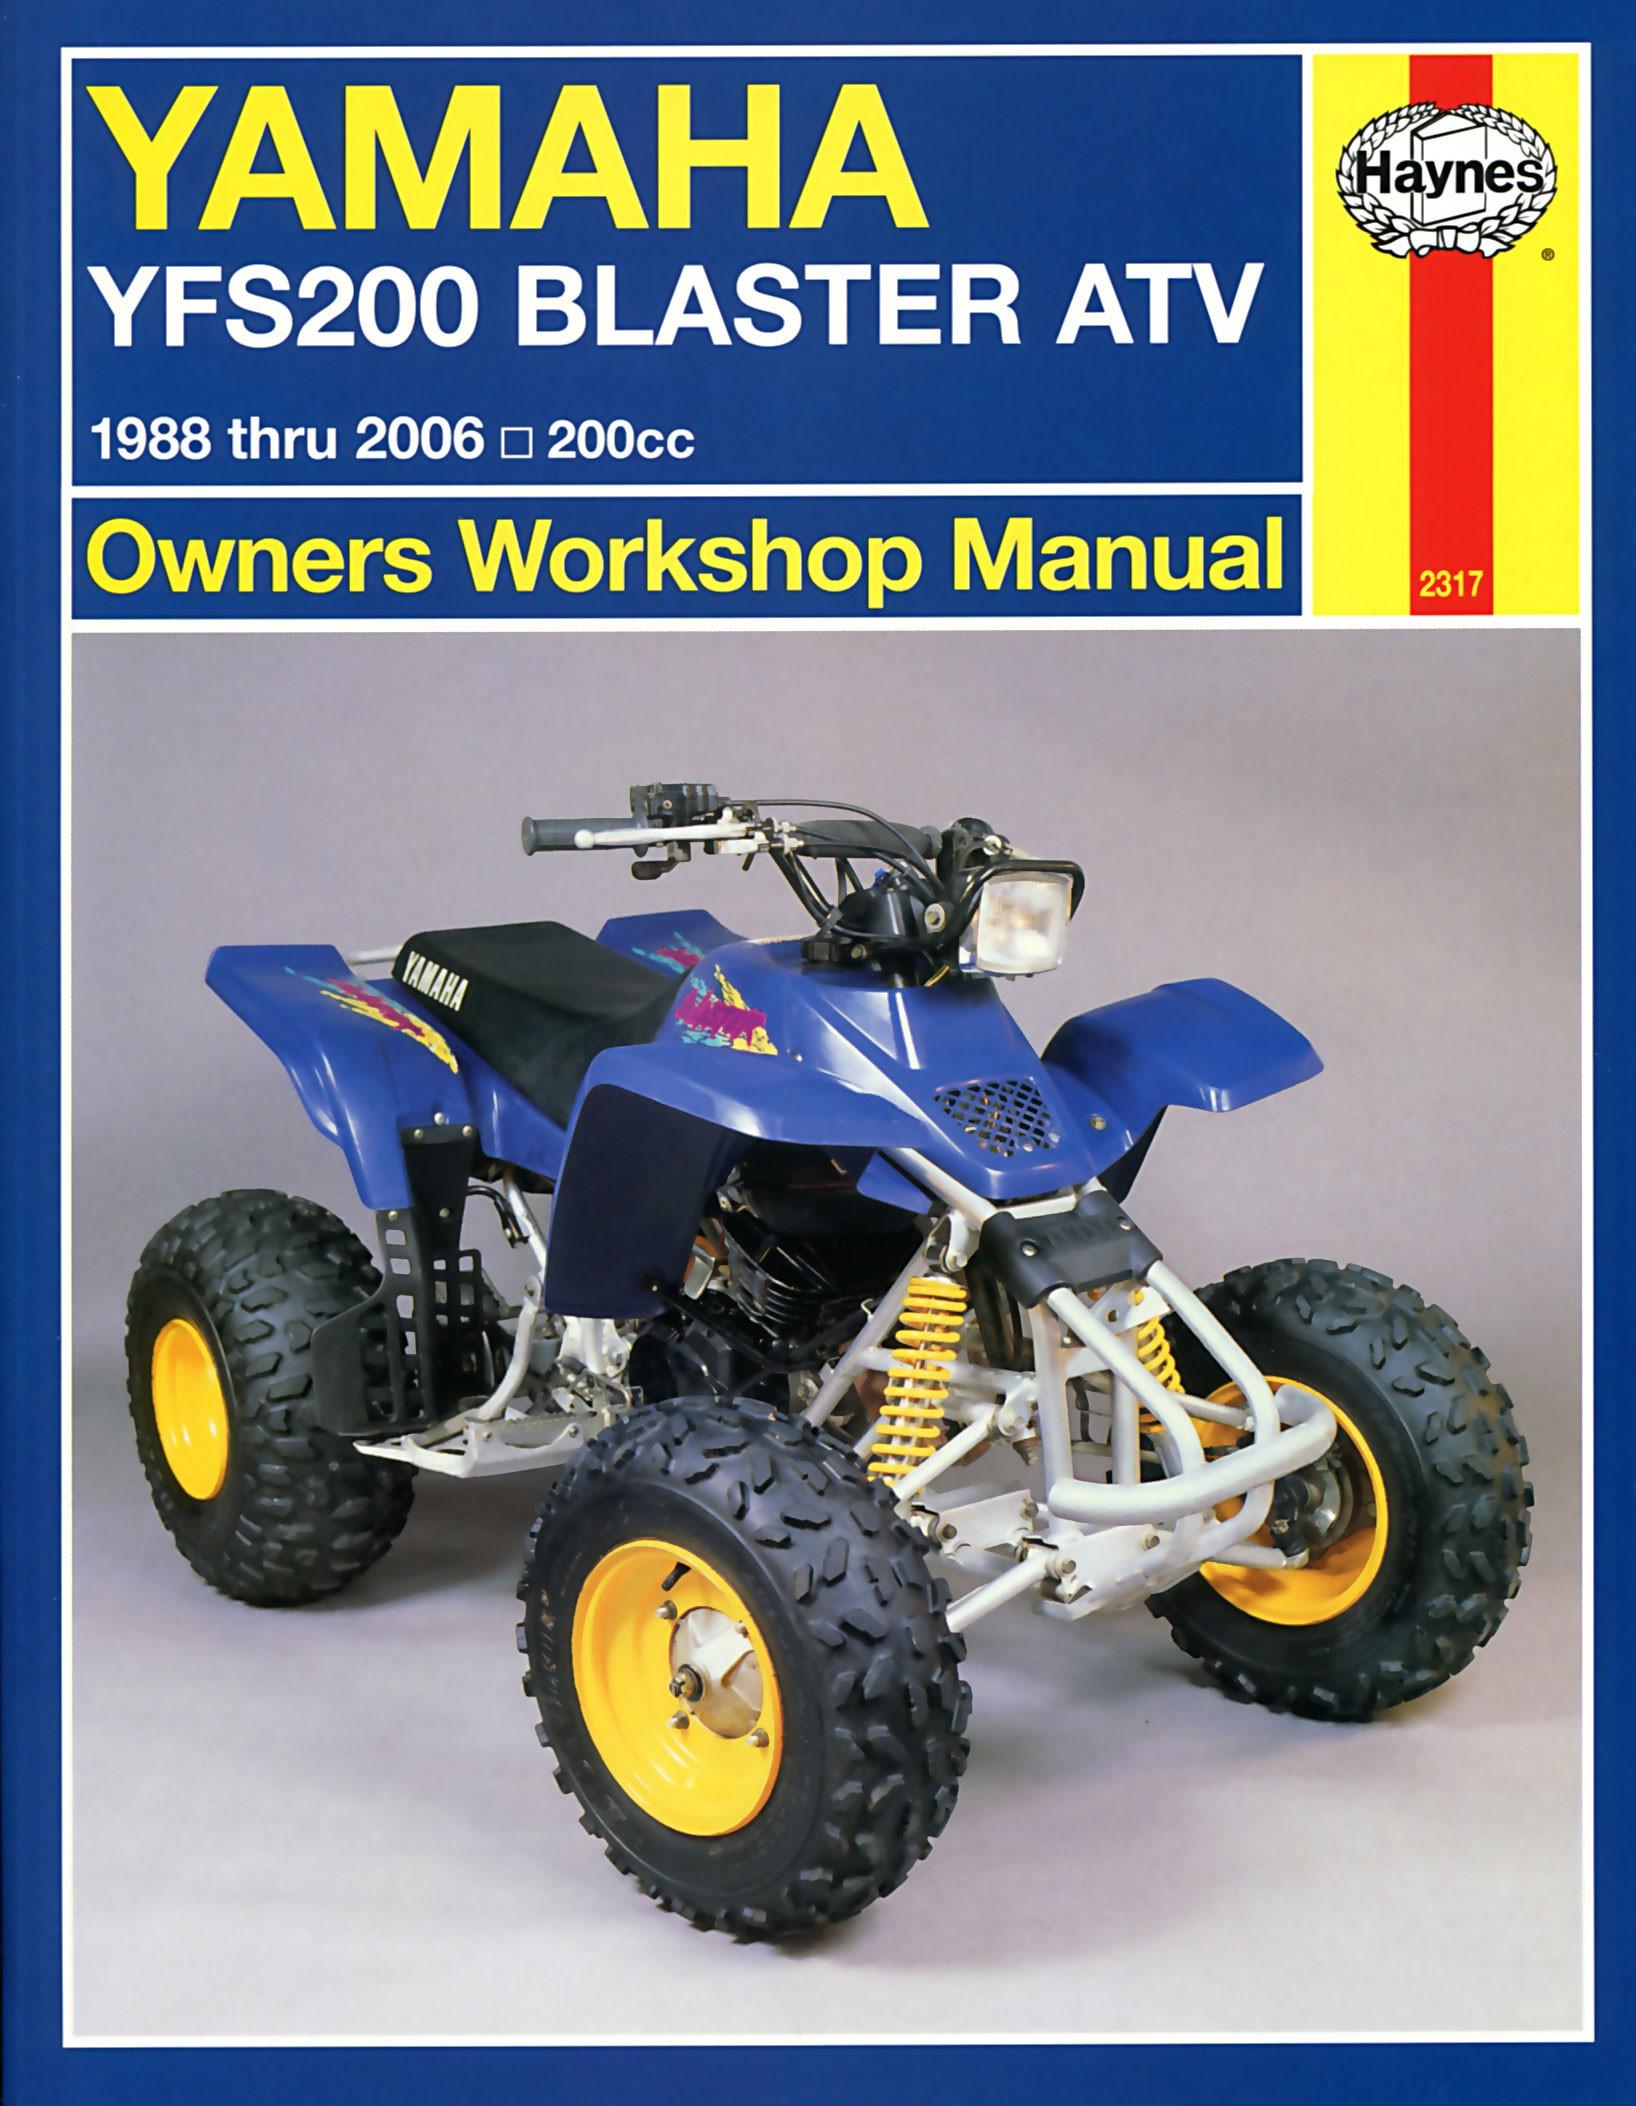 HAYNES Repair Manual - Yamaha YFS200 Blaster ATV (1988-2006) on